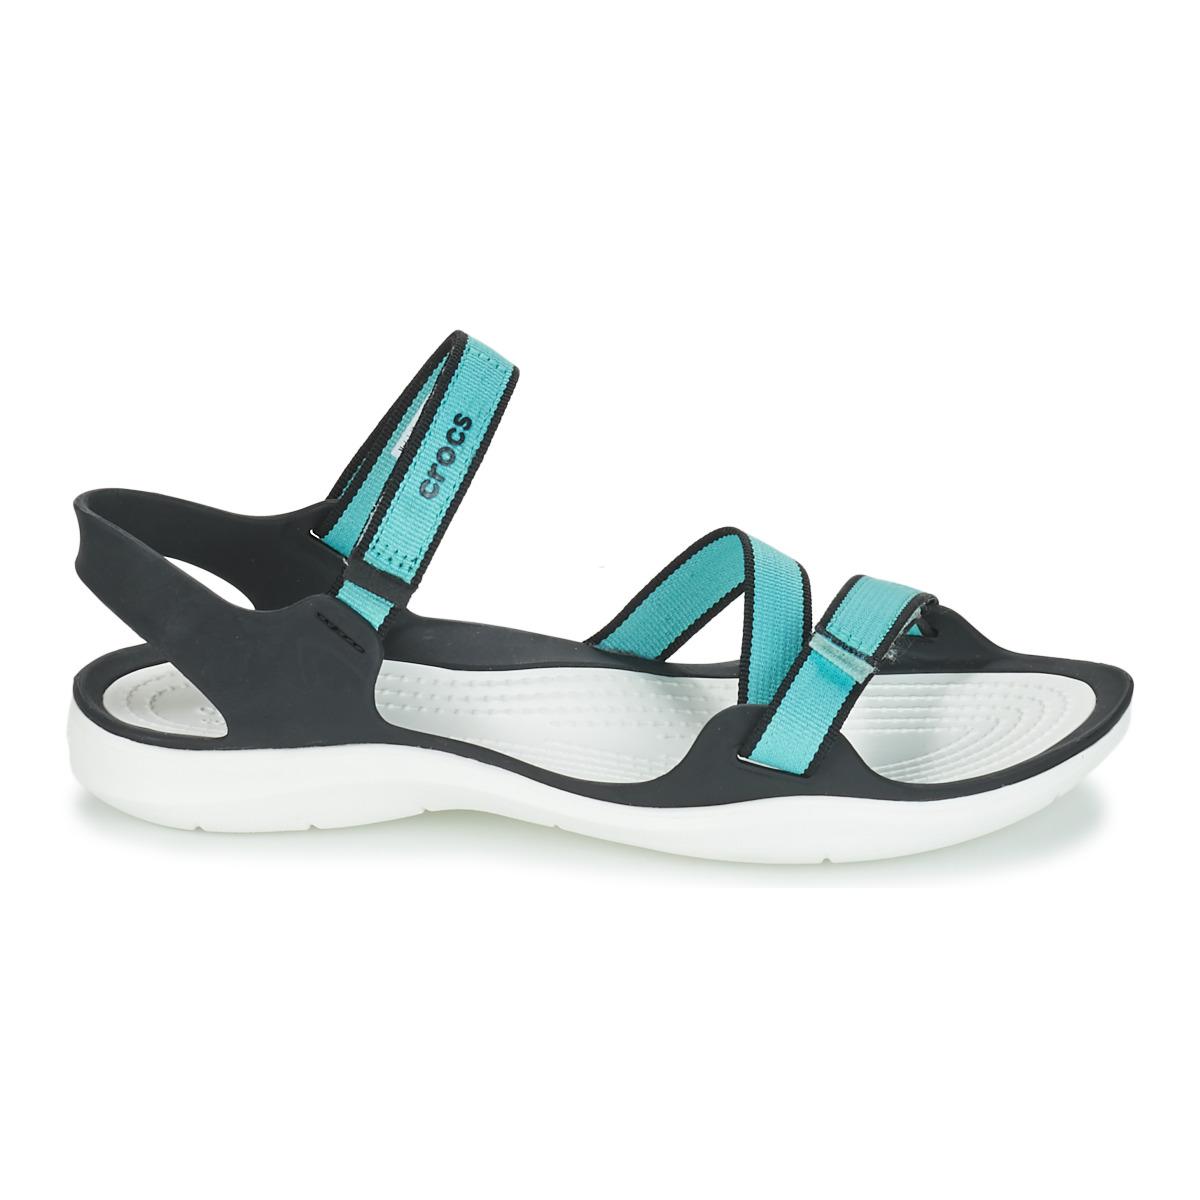 Sandales Swiftwater Sandal Webbing Crocs W 5RA4jL